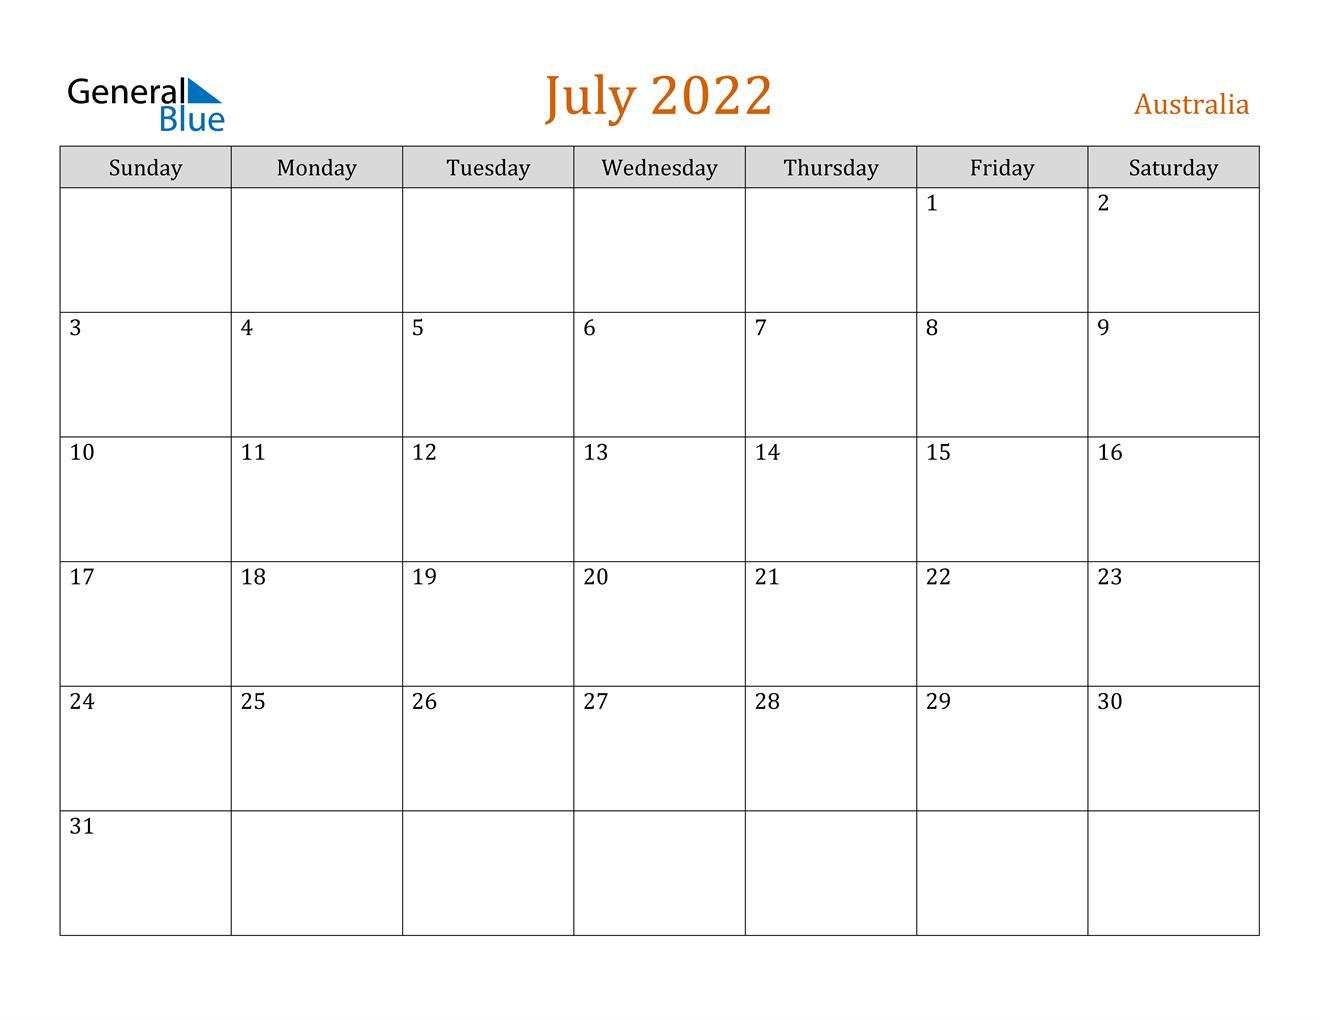 July 2022 Calendar - Australia